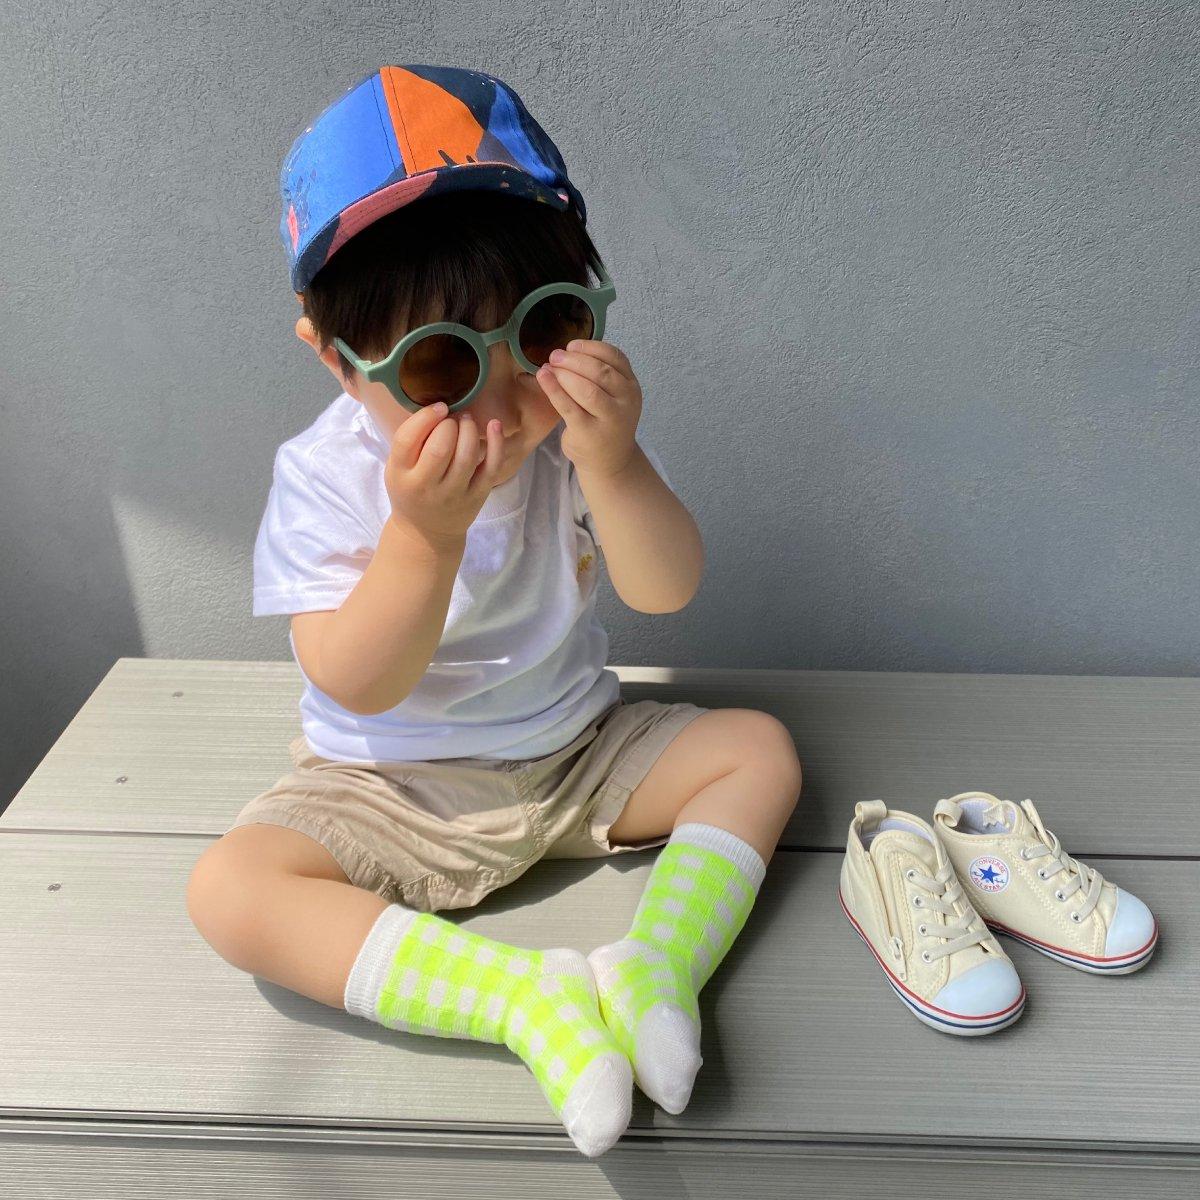 【BABY】Neon Check Socks 詳細画像18